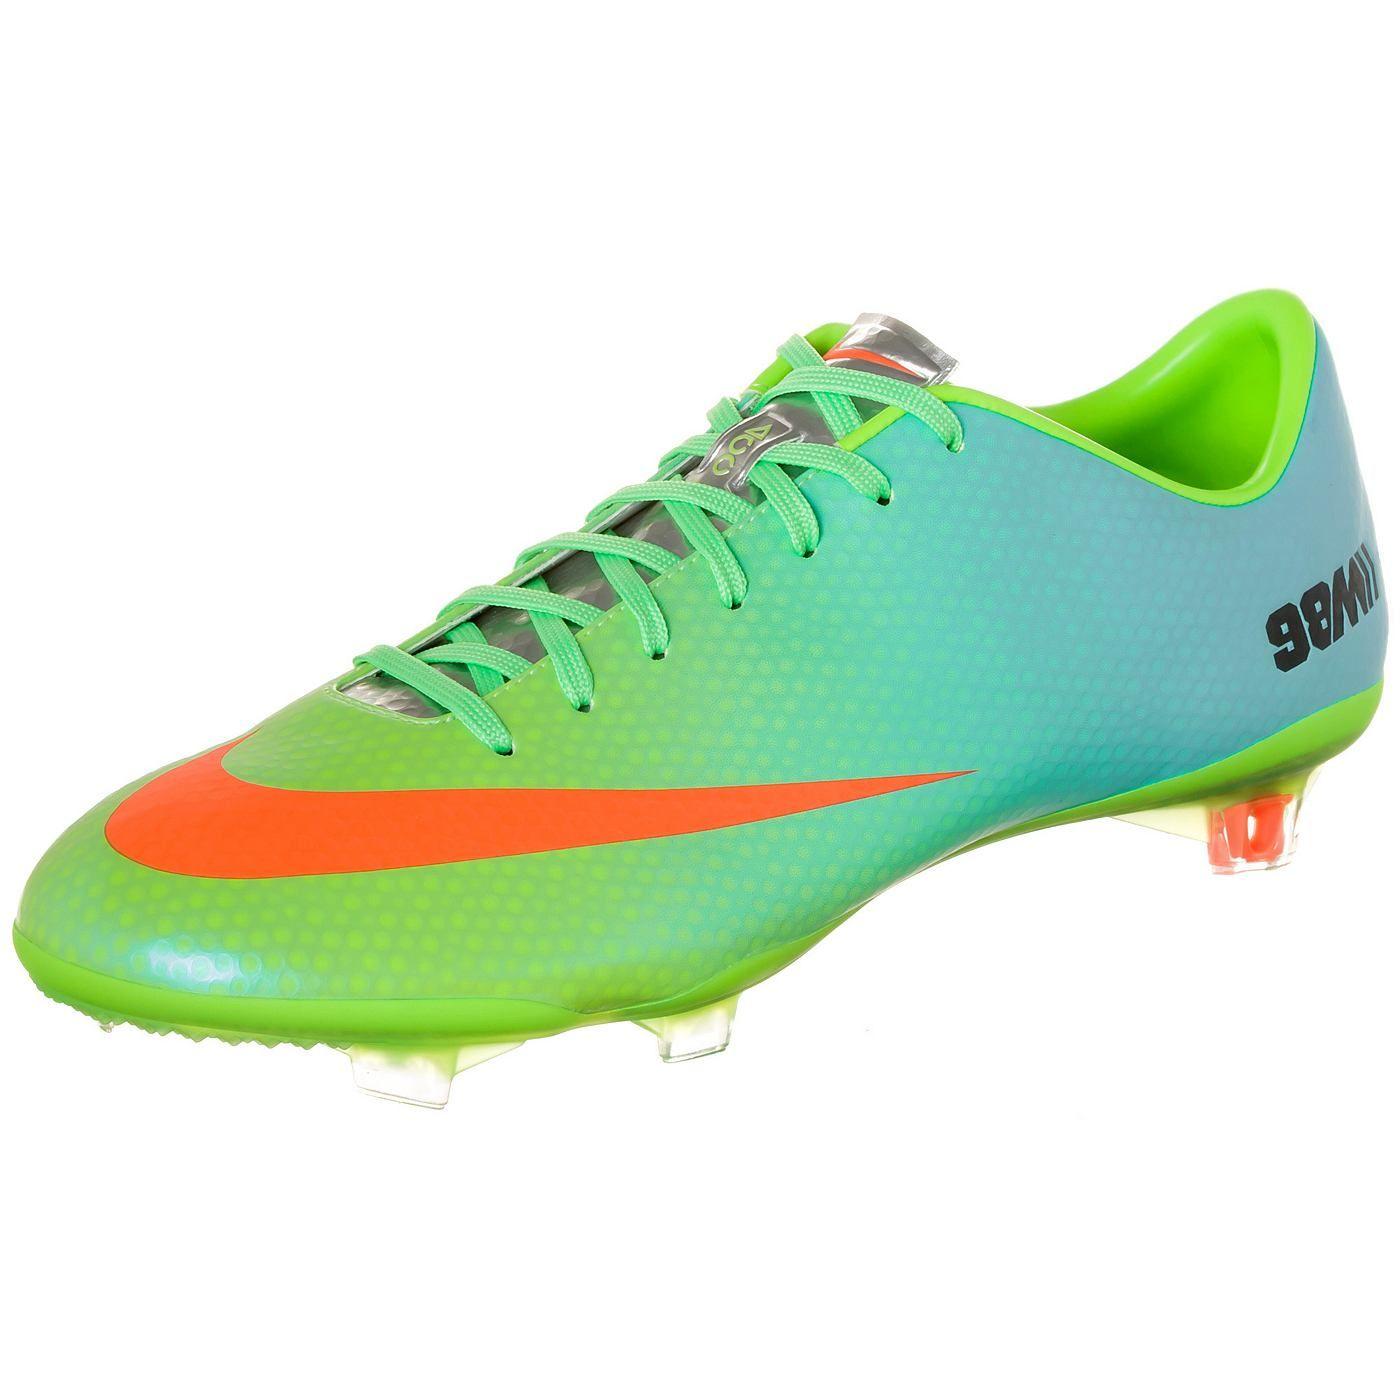 Nike Mercurial Vapor Xii Club Fussballschuh Fussballschuhe